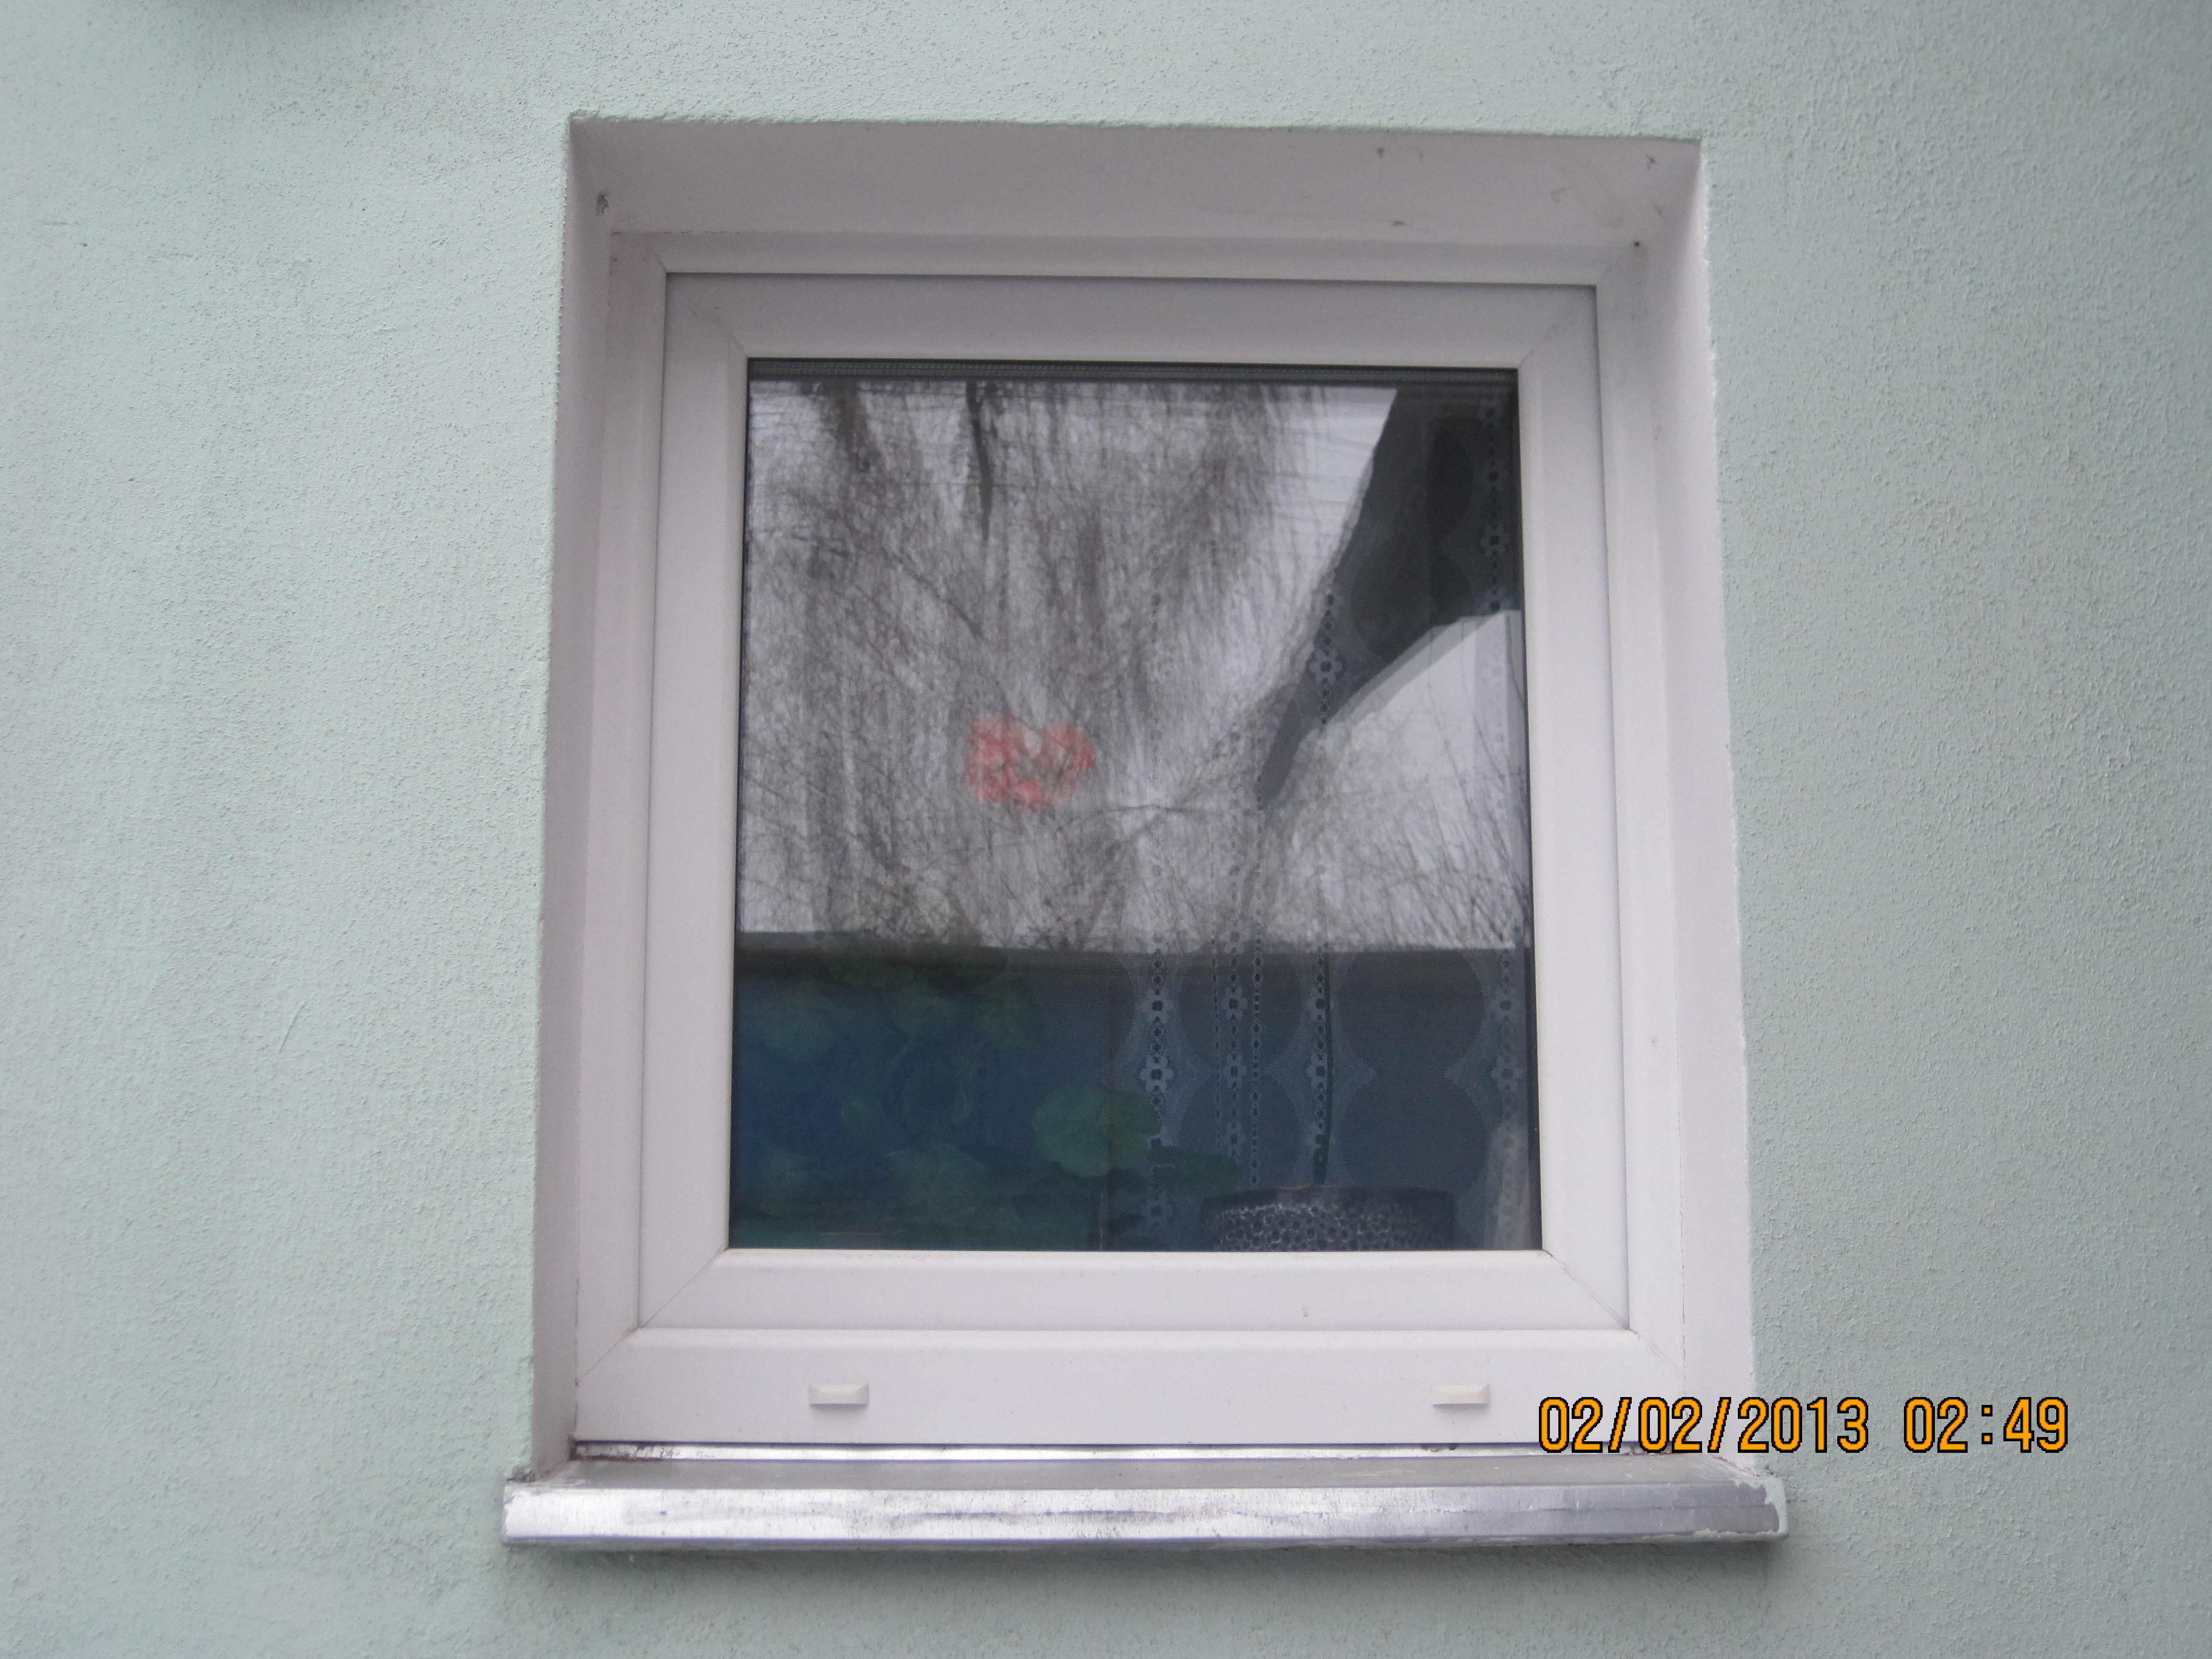 plastikovae okno